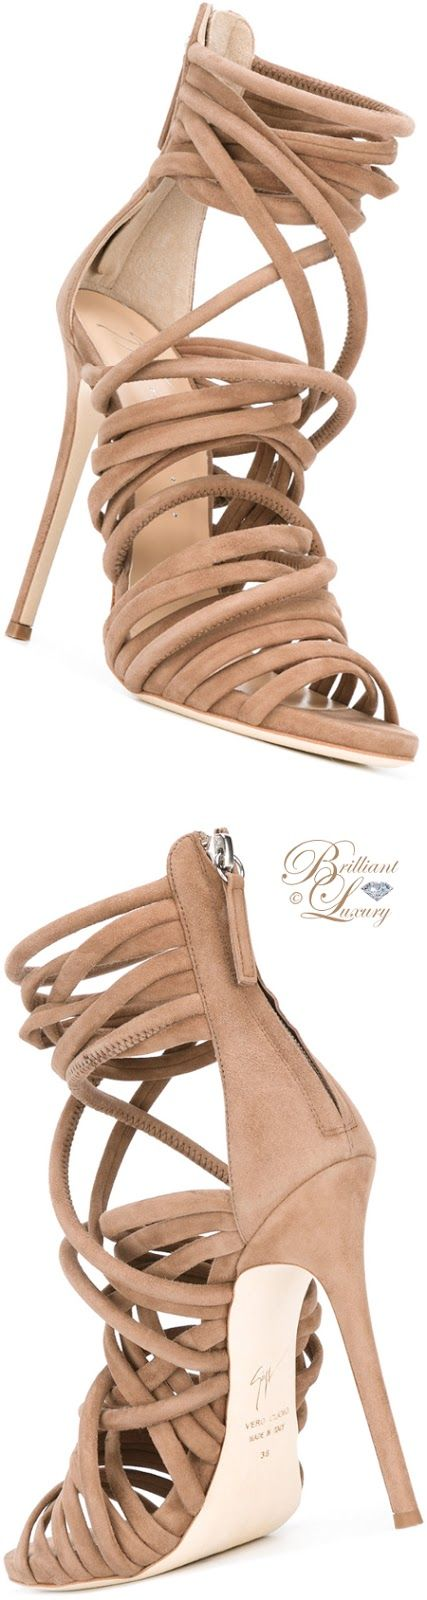 Brilliant Luxury by Emmy DE ♦ Giuseppe Zanotti Runway Sandals